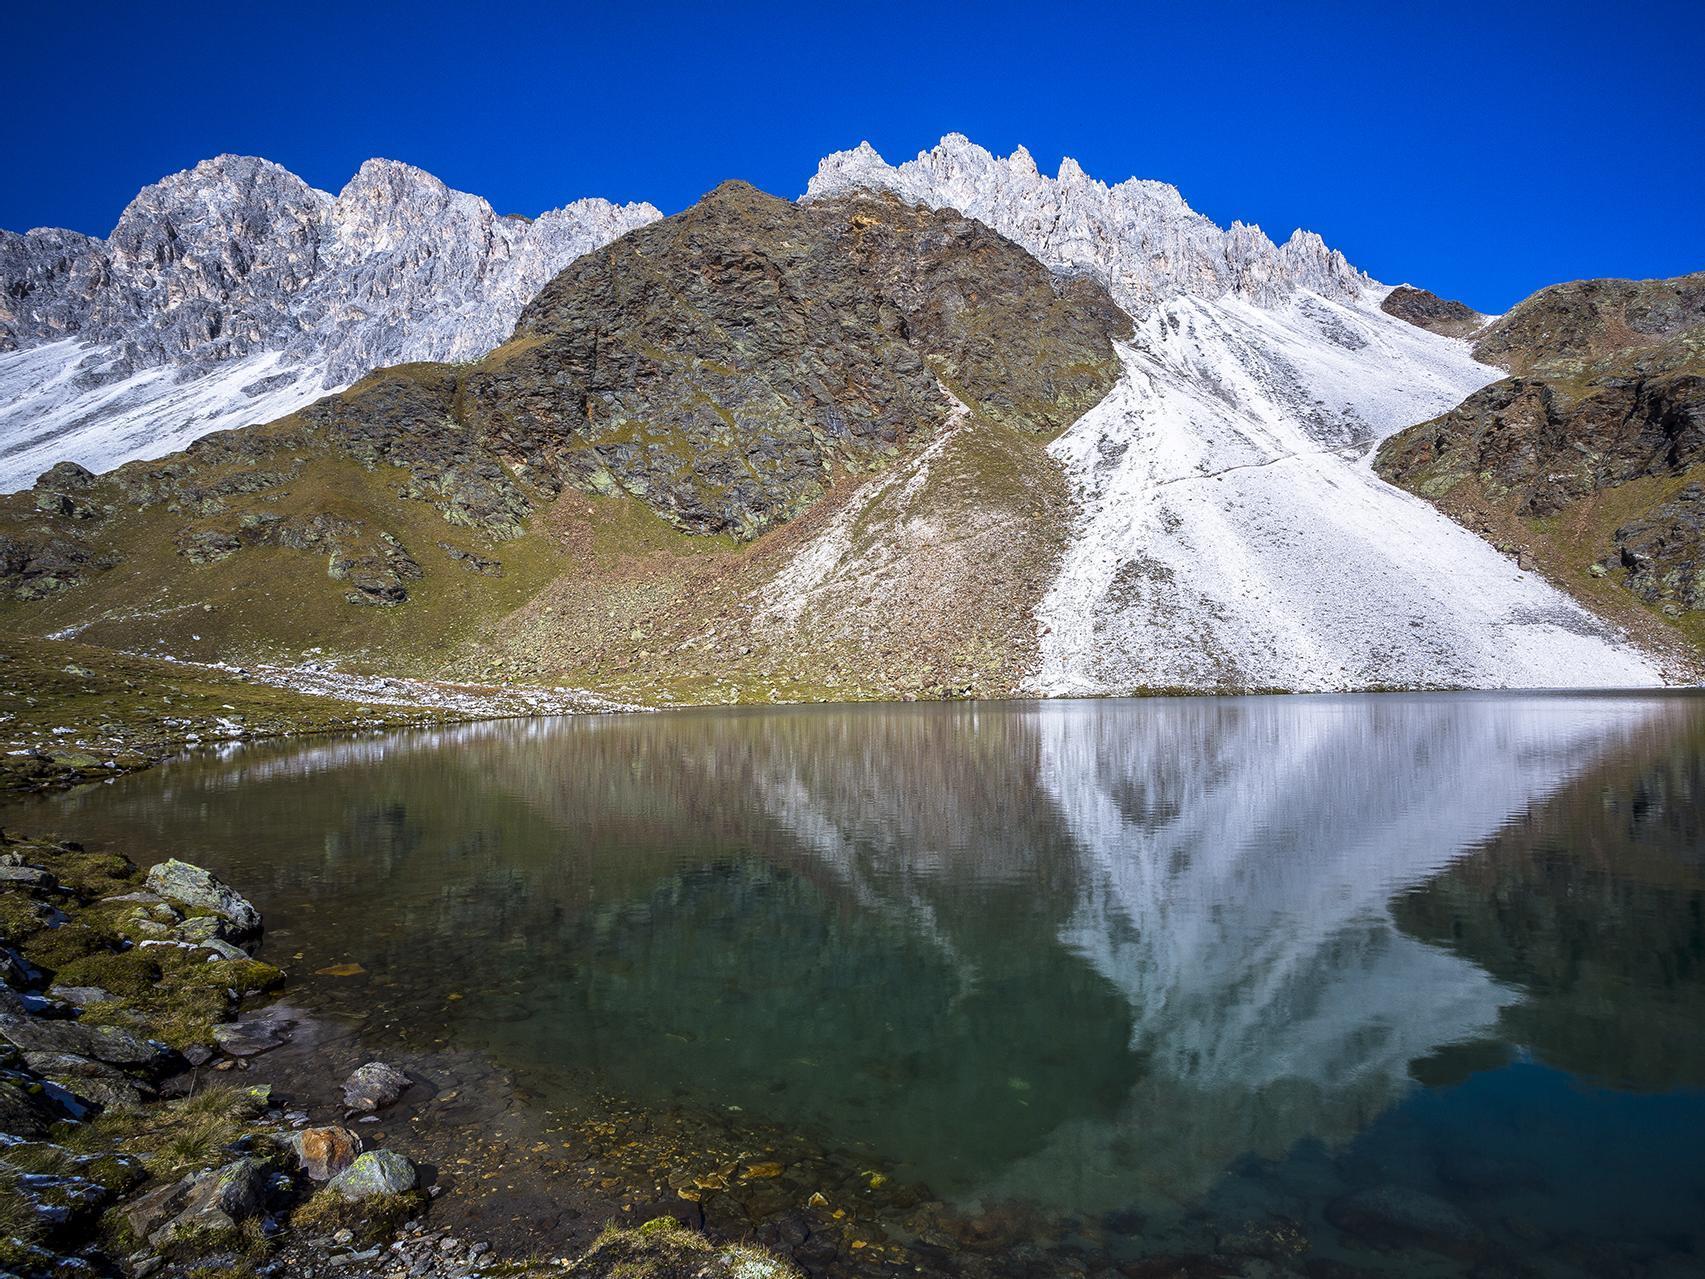 Wanderung zu den Sieben Seen